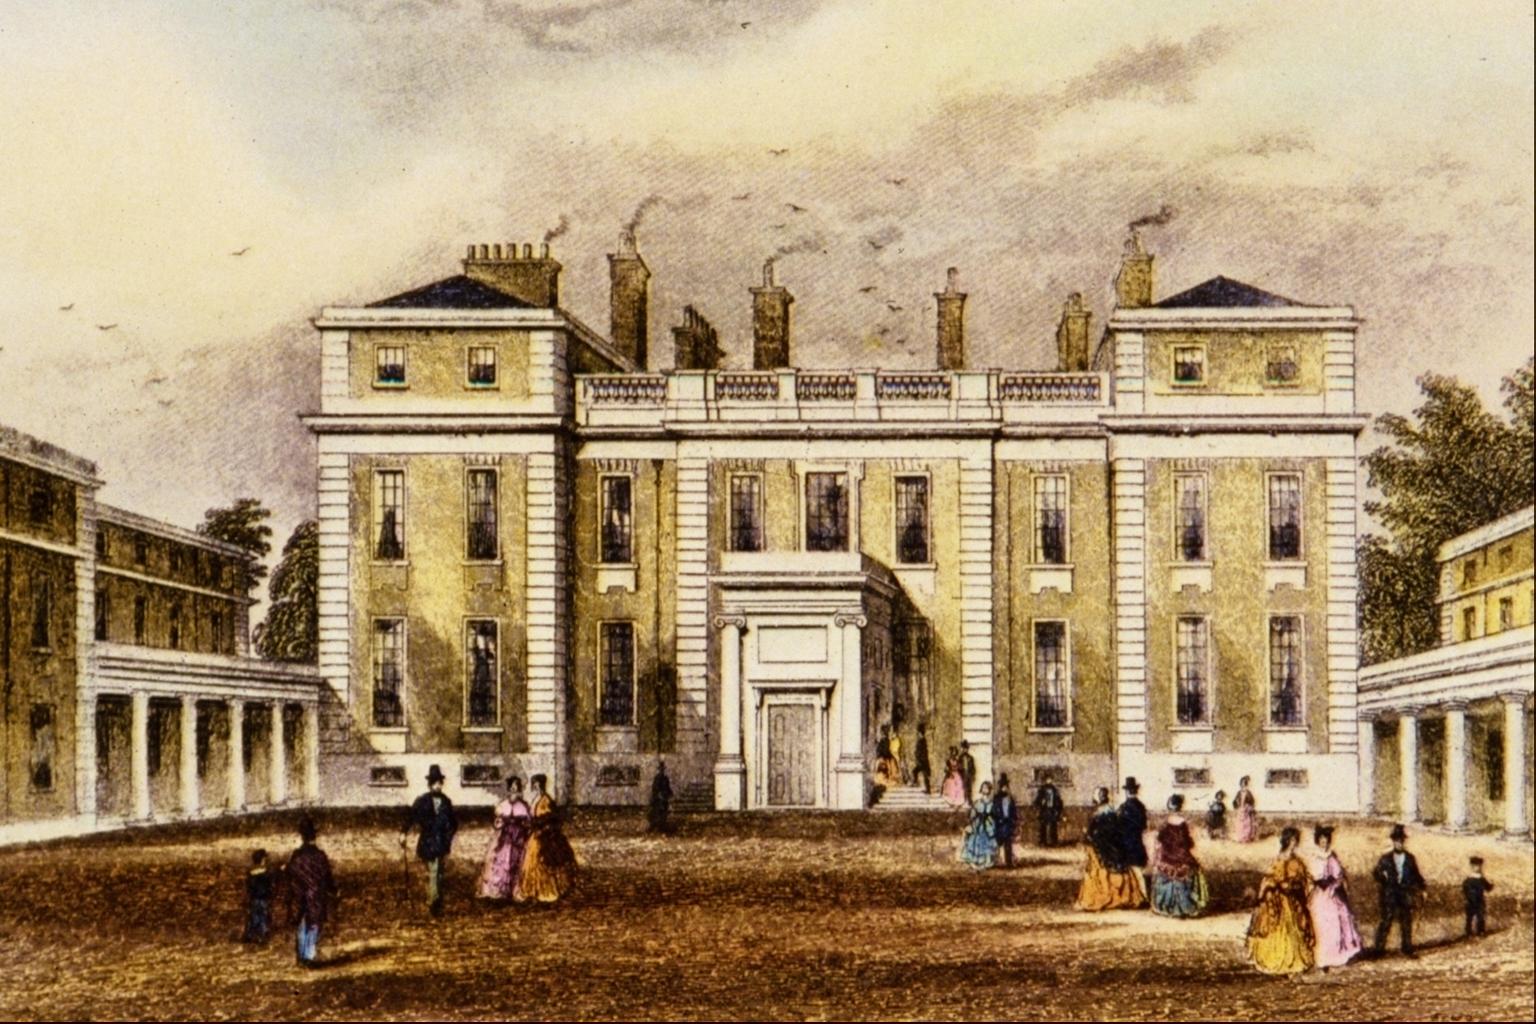 File:Marlborough House - Thomas Hosmer Shepherd.png - Wikimedia ...